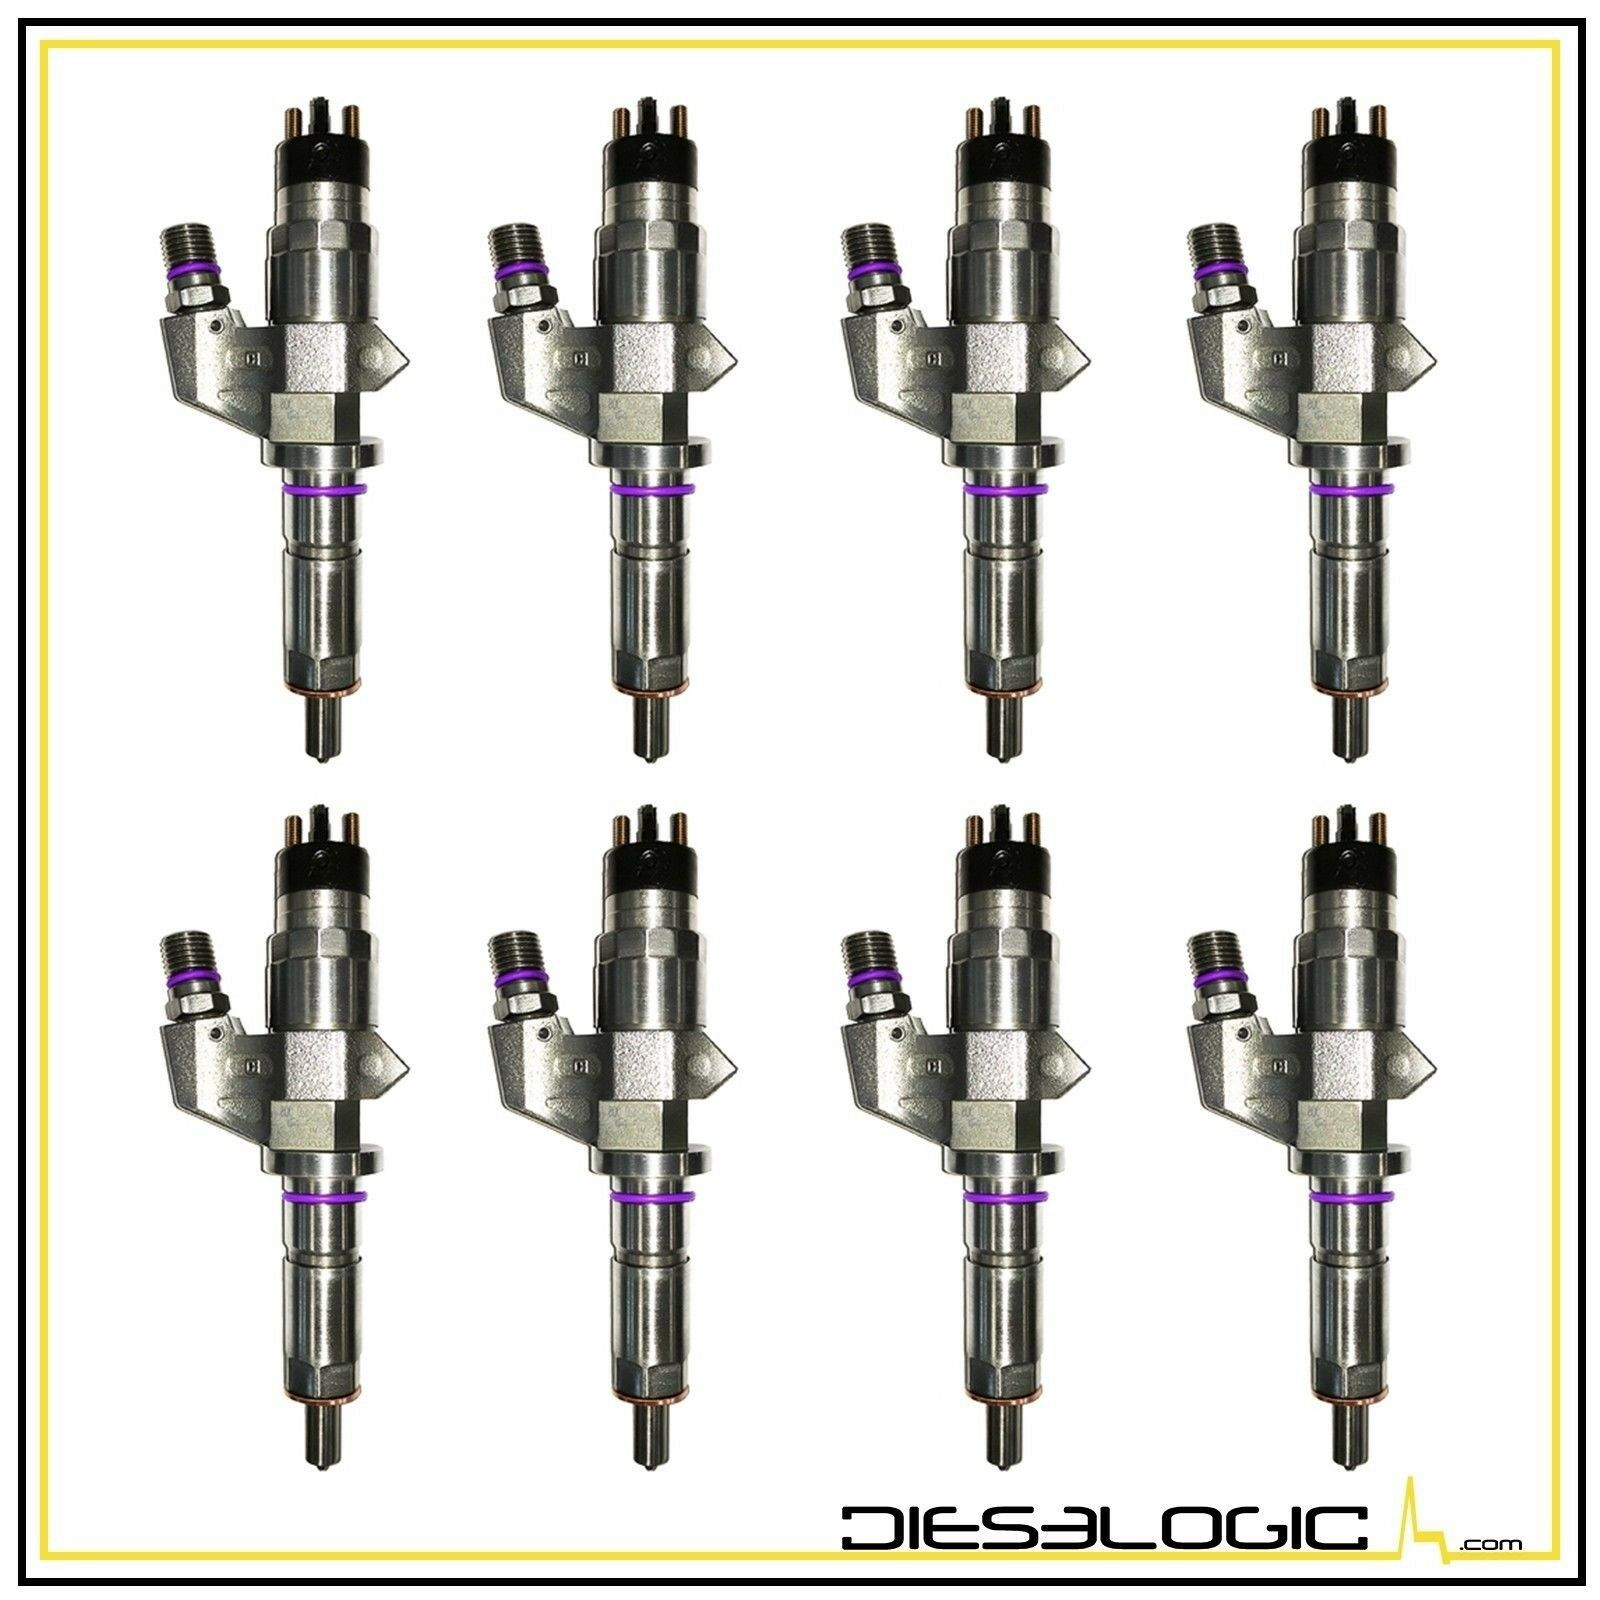 3. Dieselogic 2001-2004 CHEVY/GMC DURAMAX LB7 6.6L DIESEL INJECTOR LB7 SET